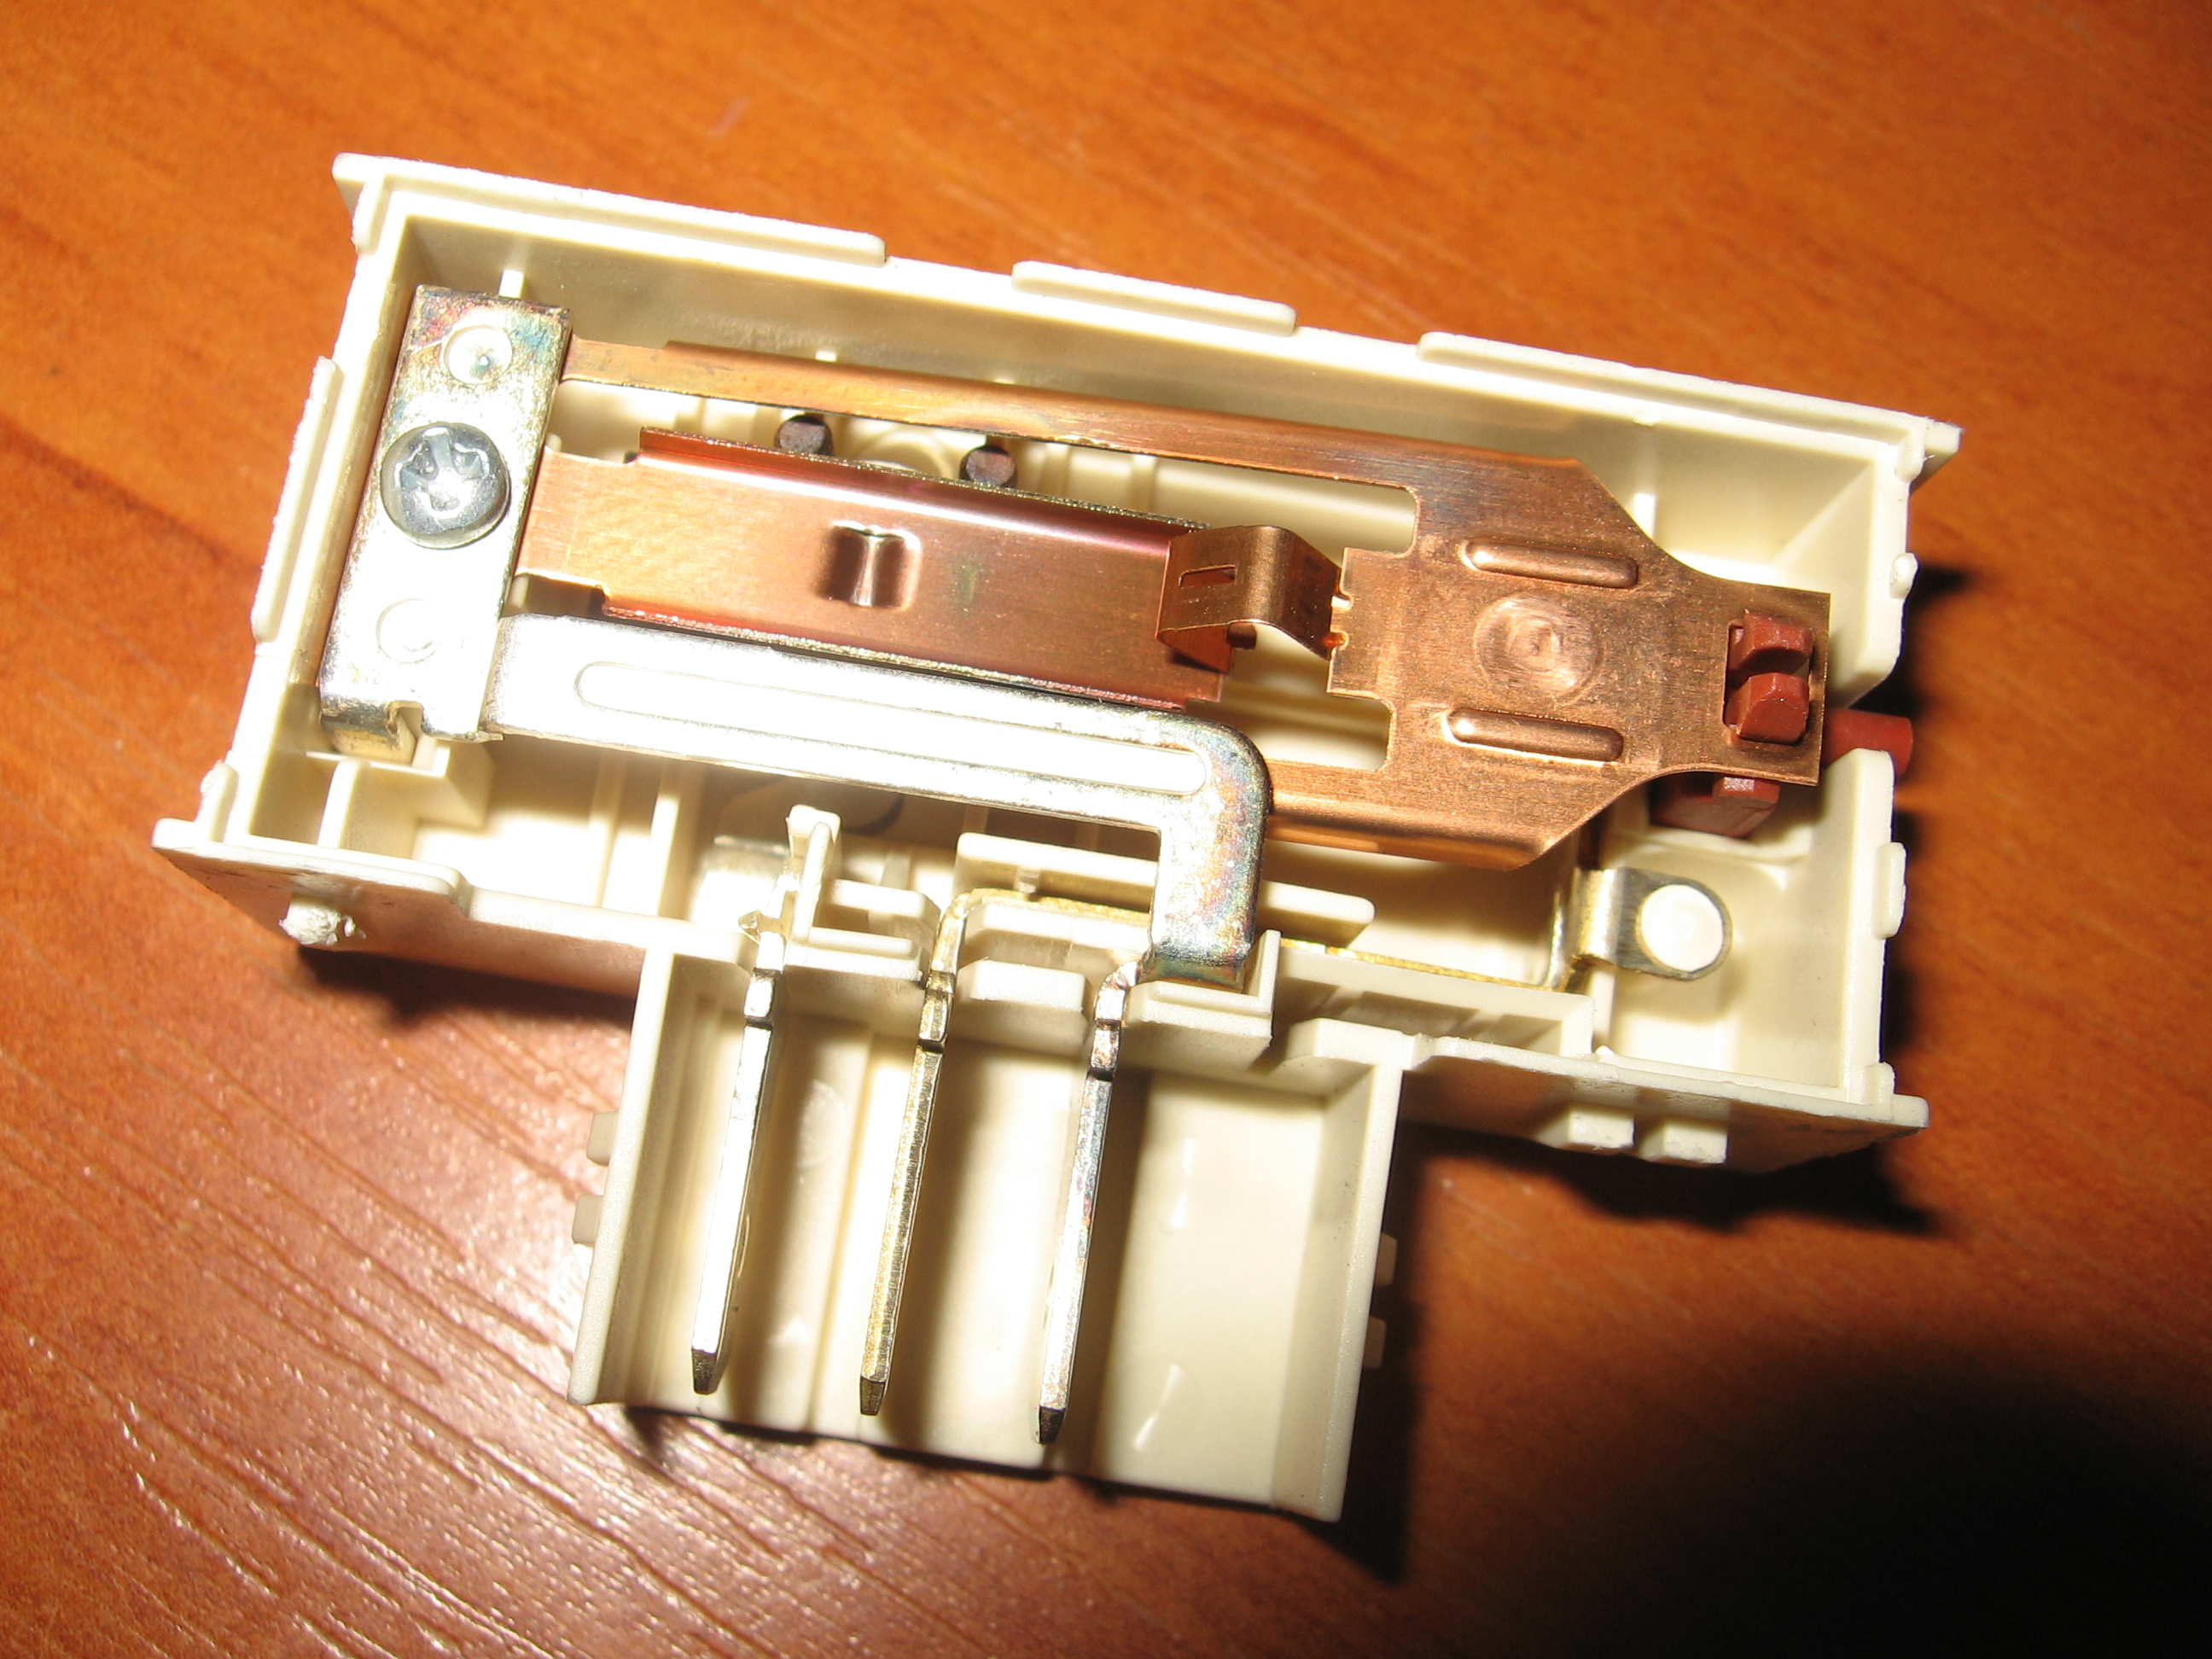 R1045AV - Wy��cza r�nic�wk�